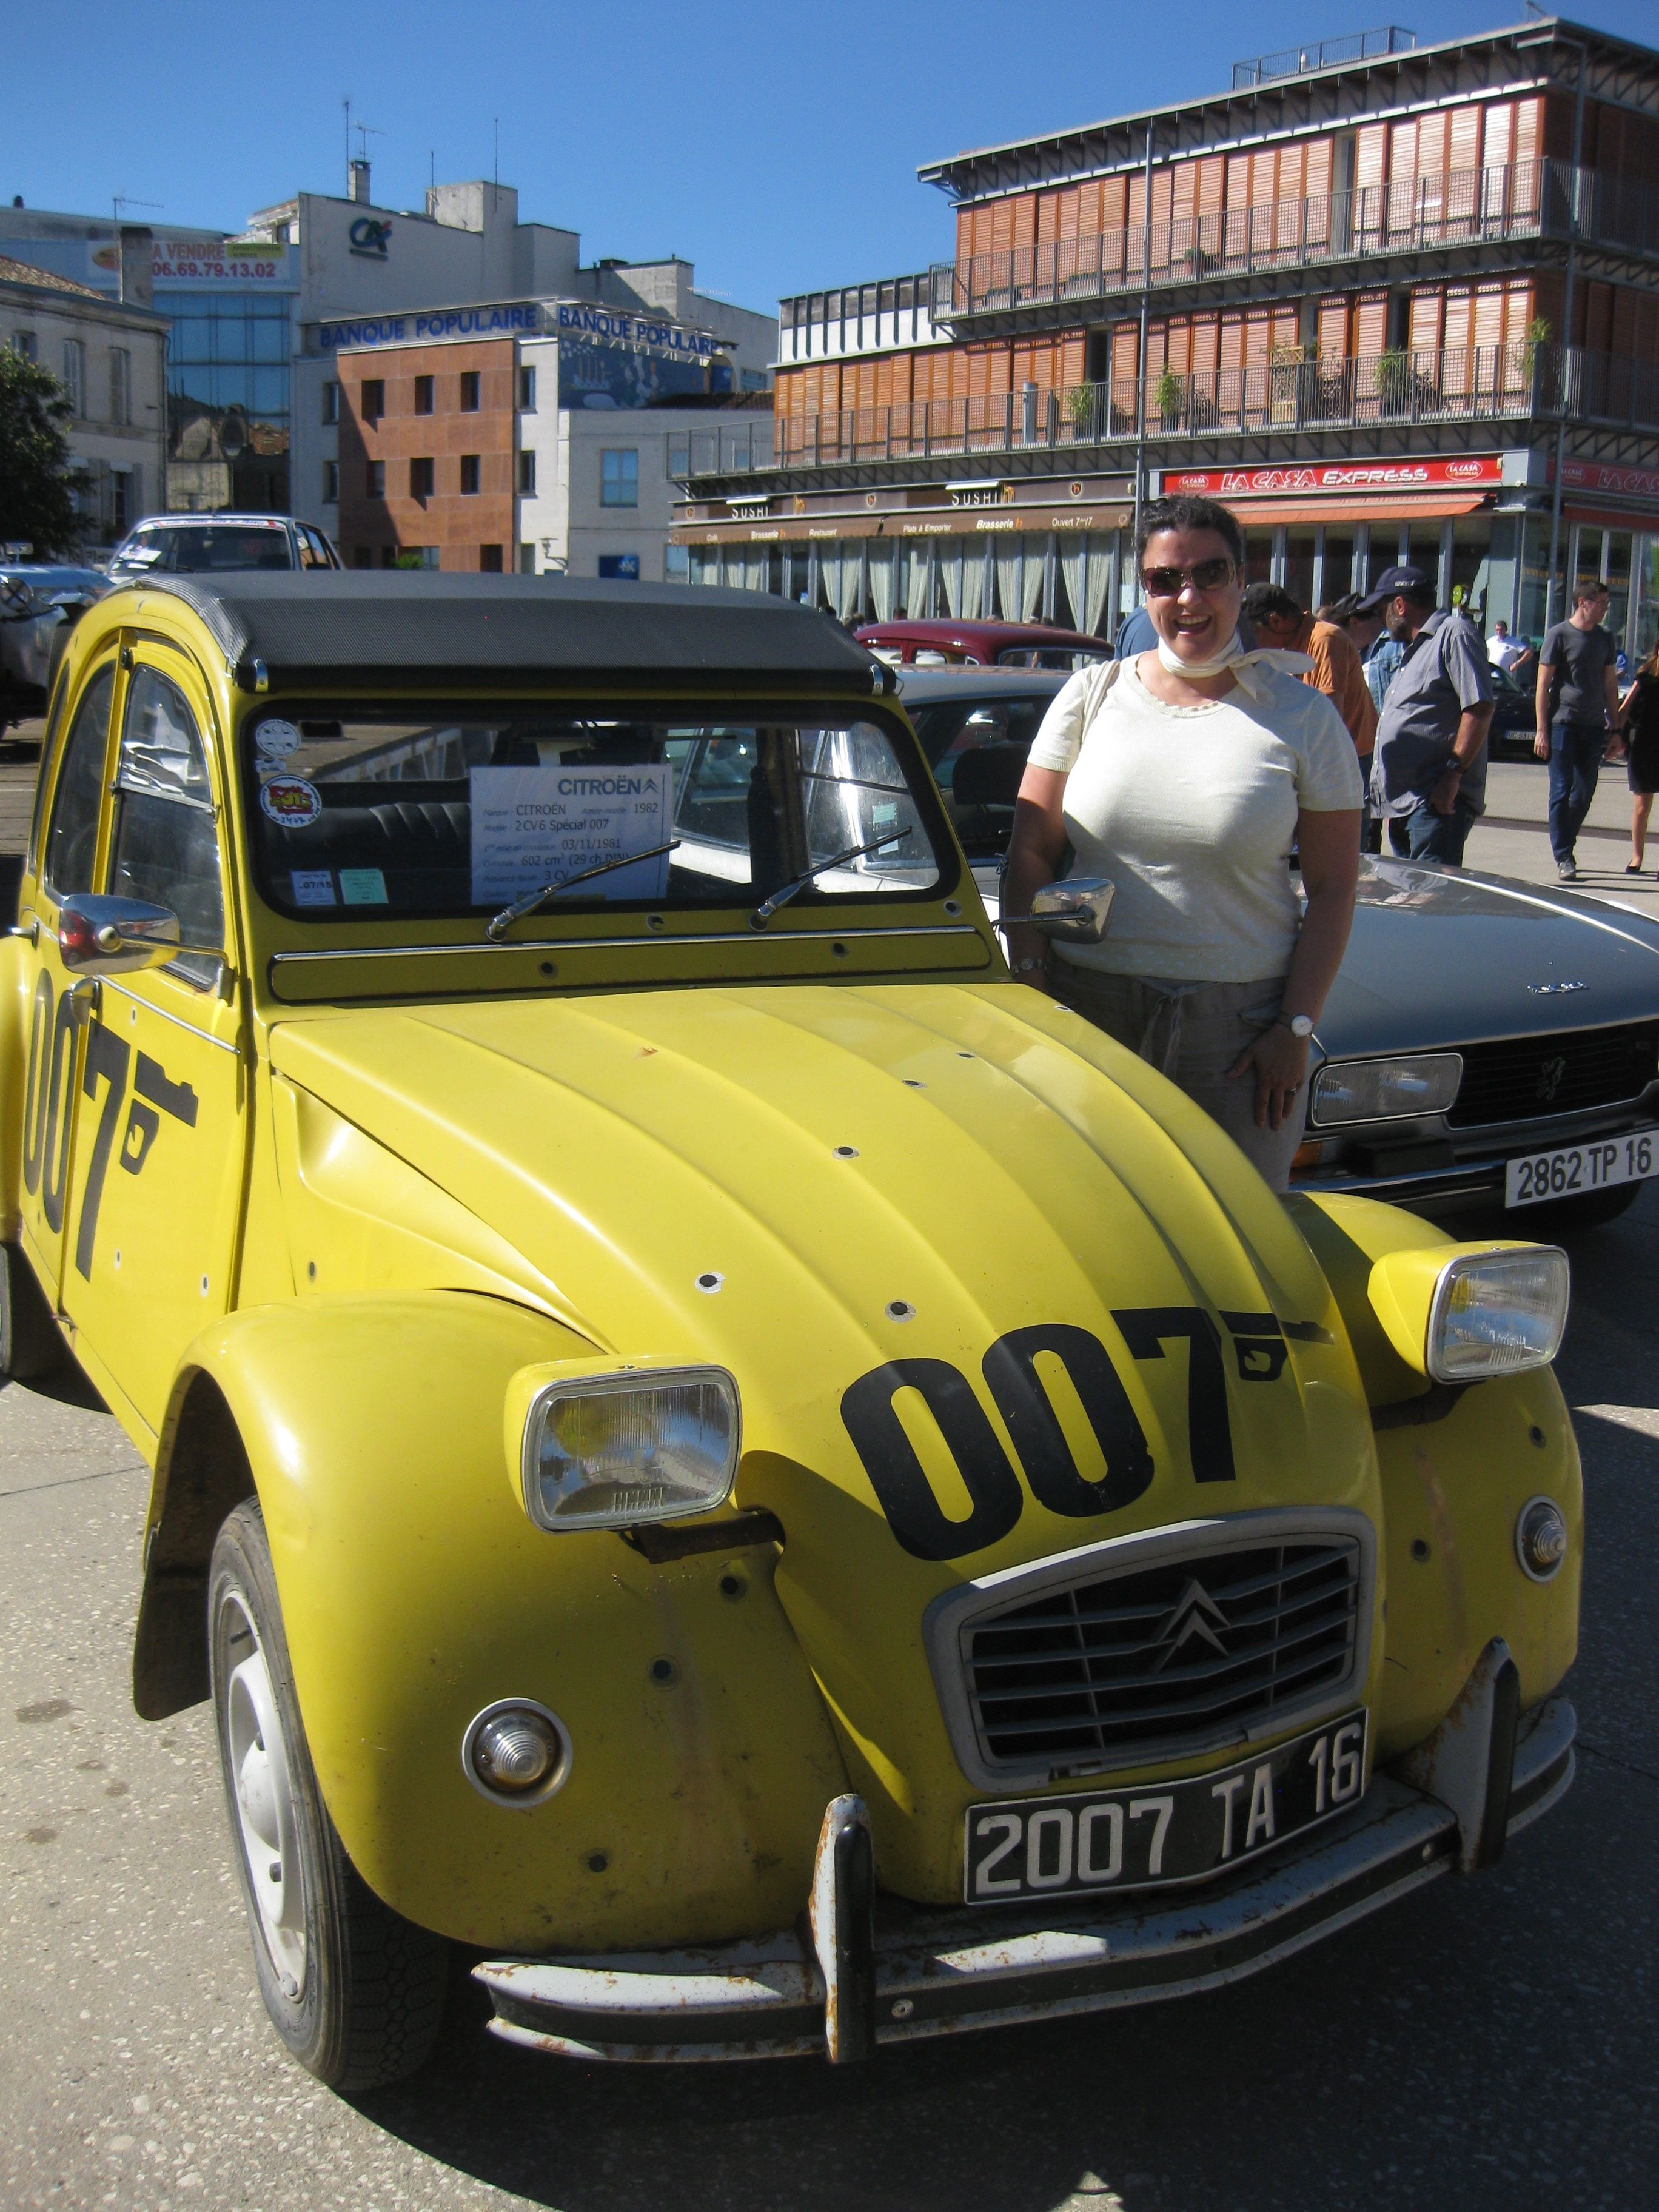 007 2cv Angouleme Circuits Des Remparts Mre Velodocteurs Favourite Car Not Only Yellow But James Bond Themed Www Velodocteu 2cv Citroen 2cv Petites Voitures